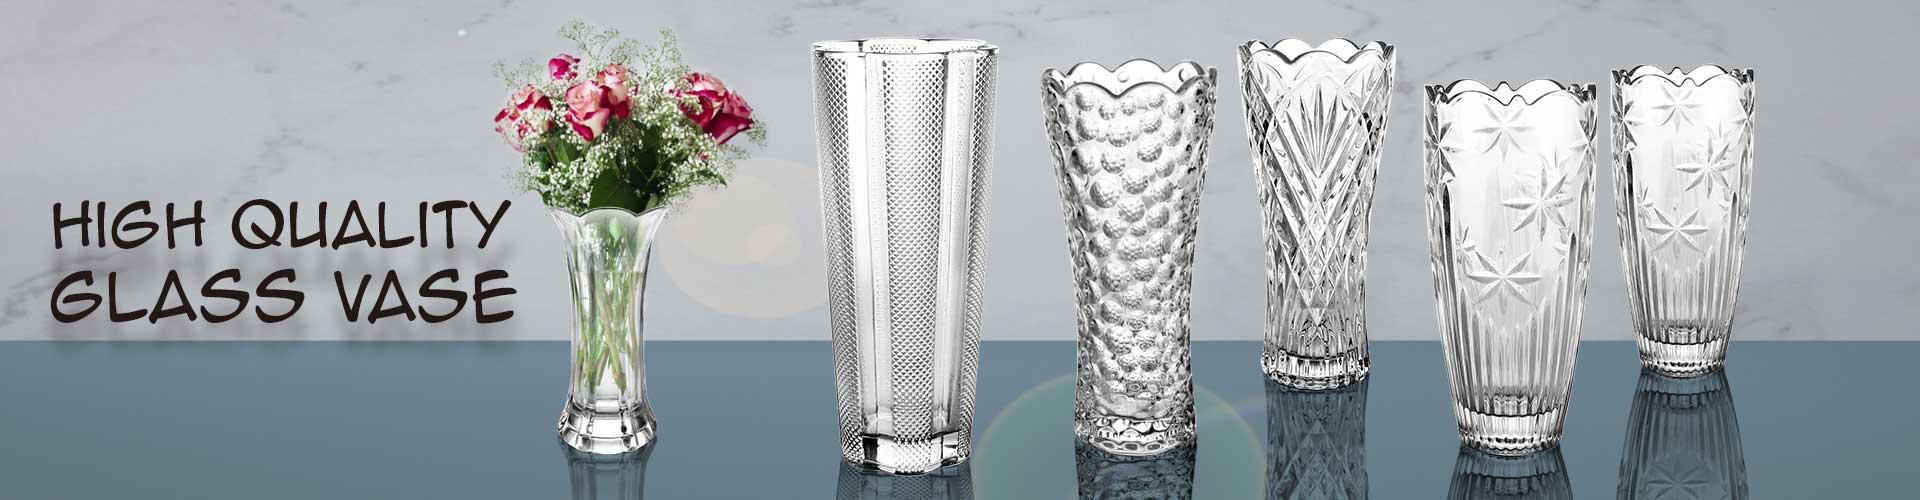 florero de cristal promocional